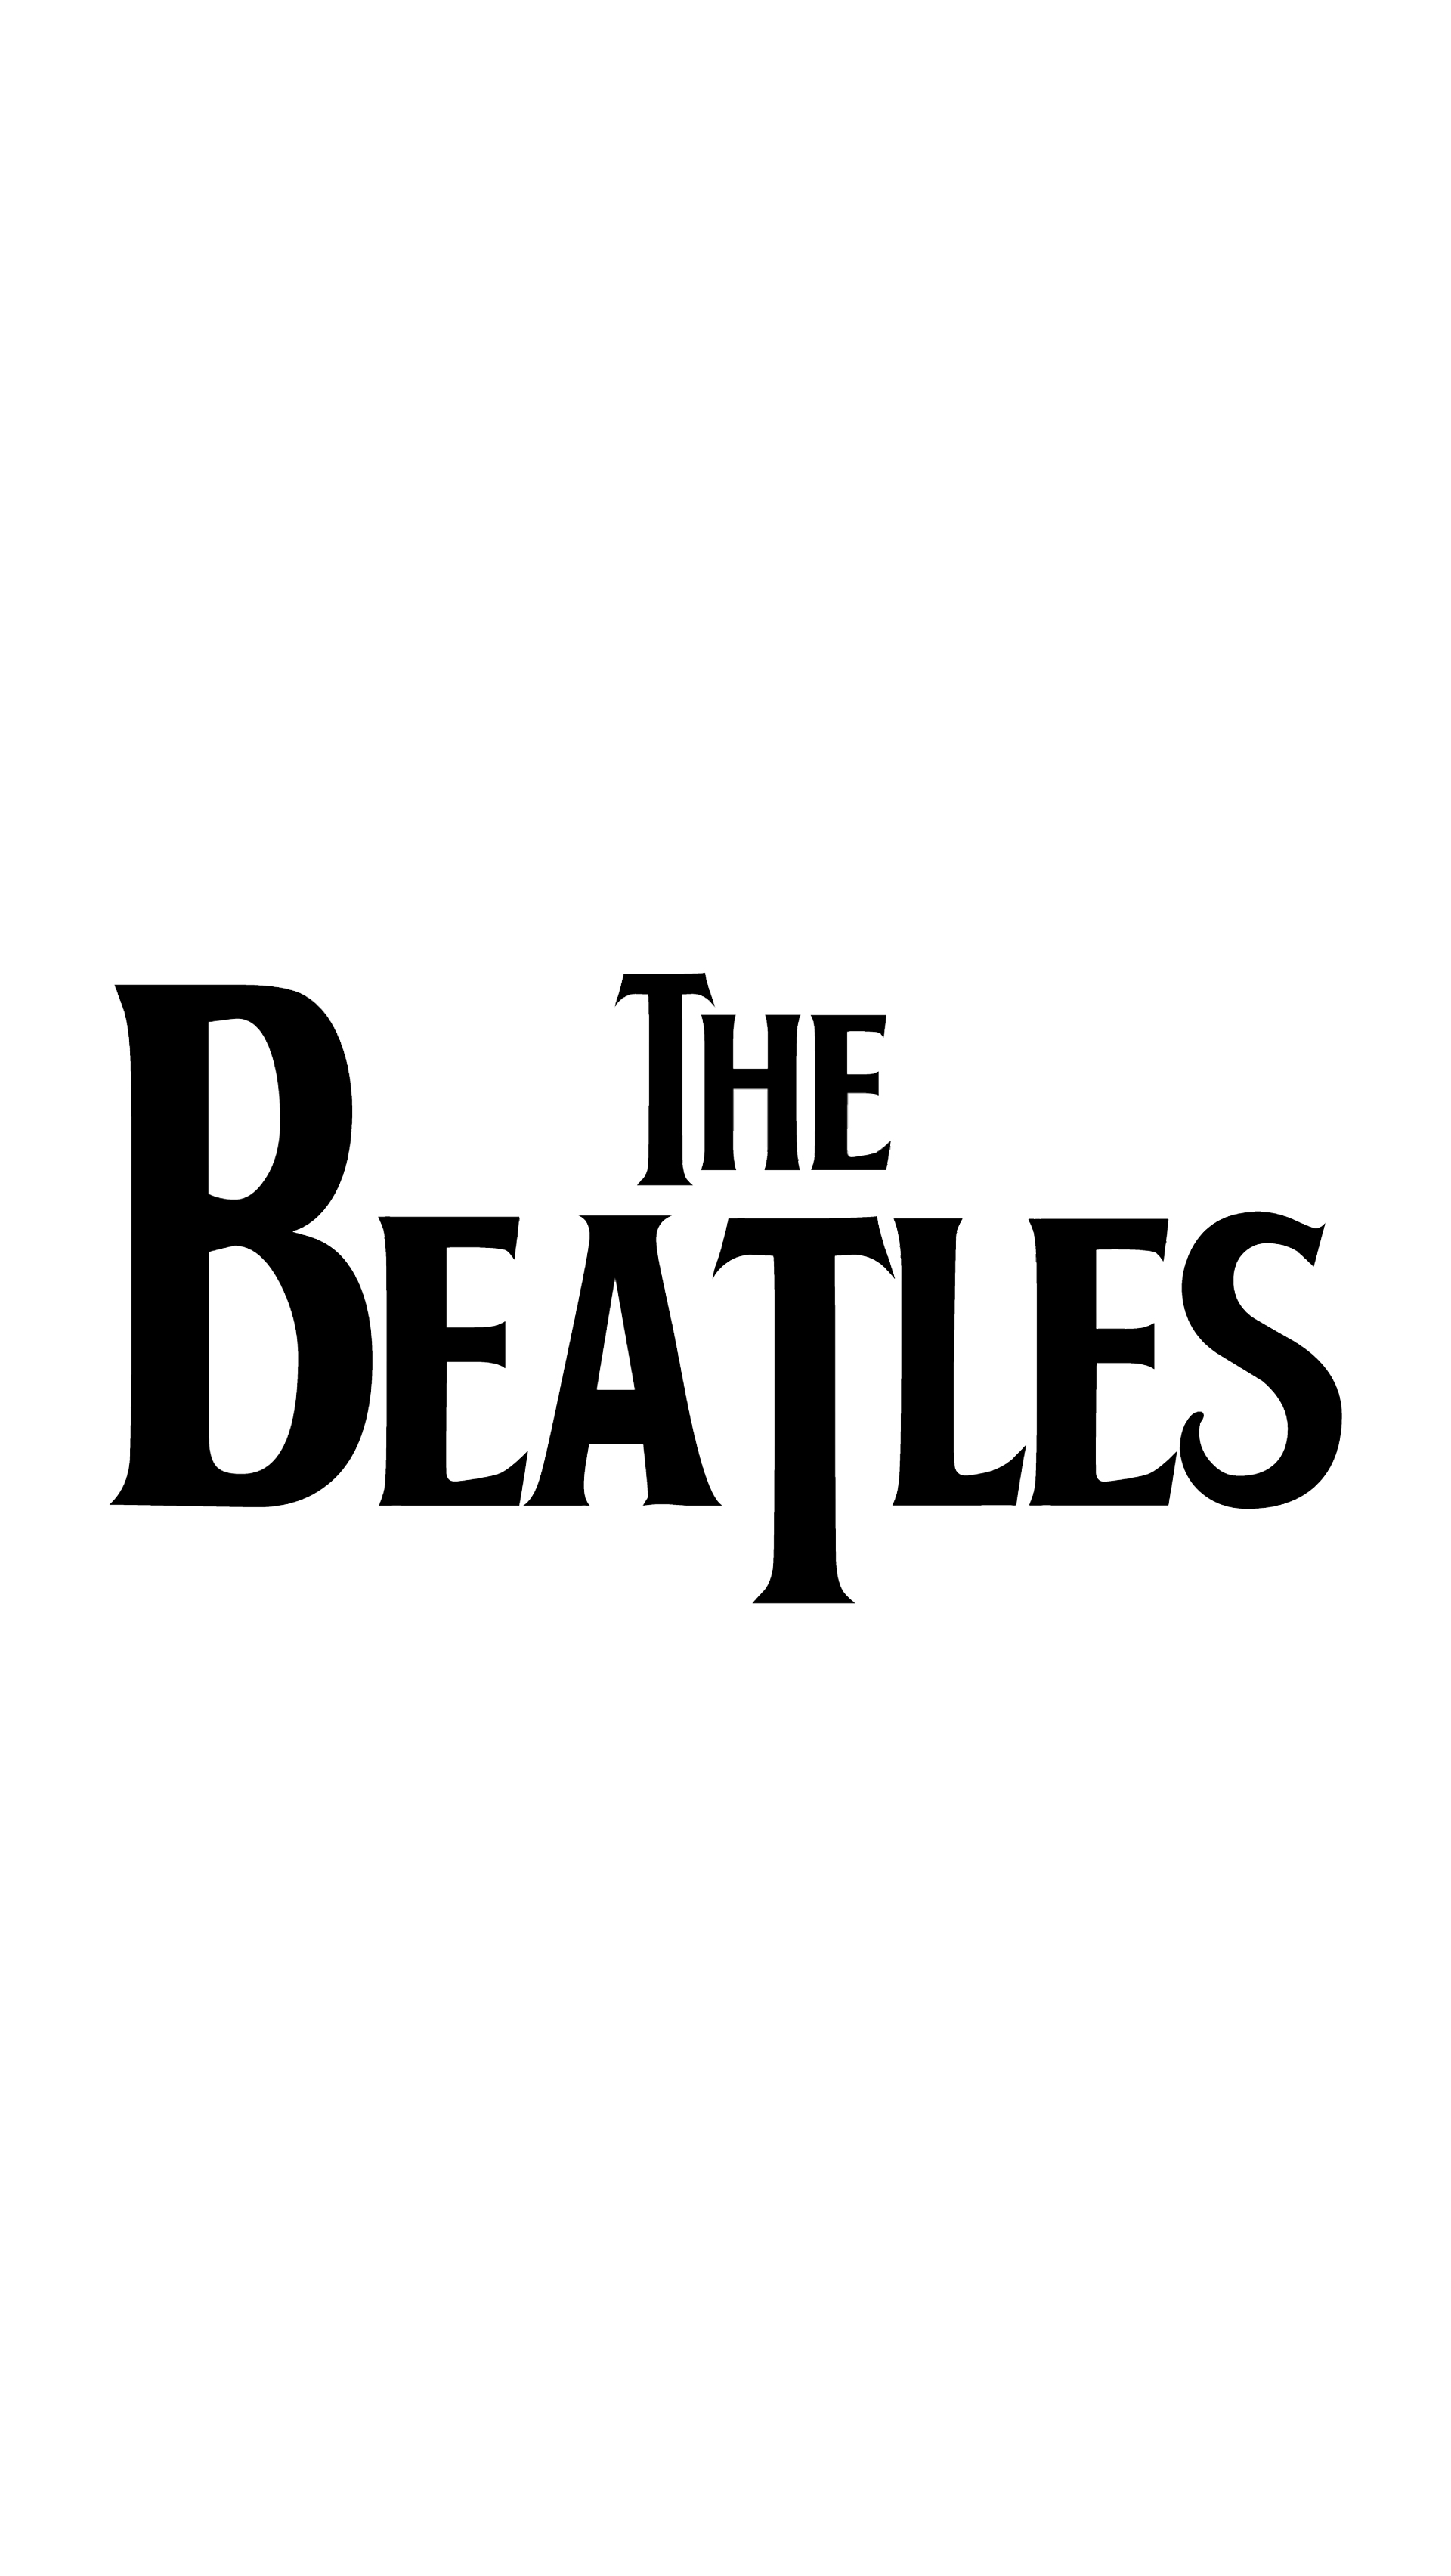 The beatles - The beatles wallpaper iphone ...